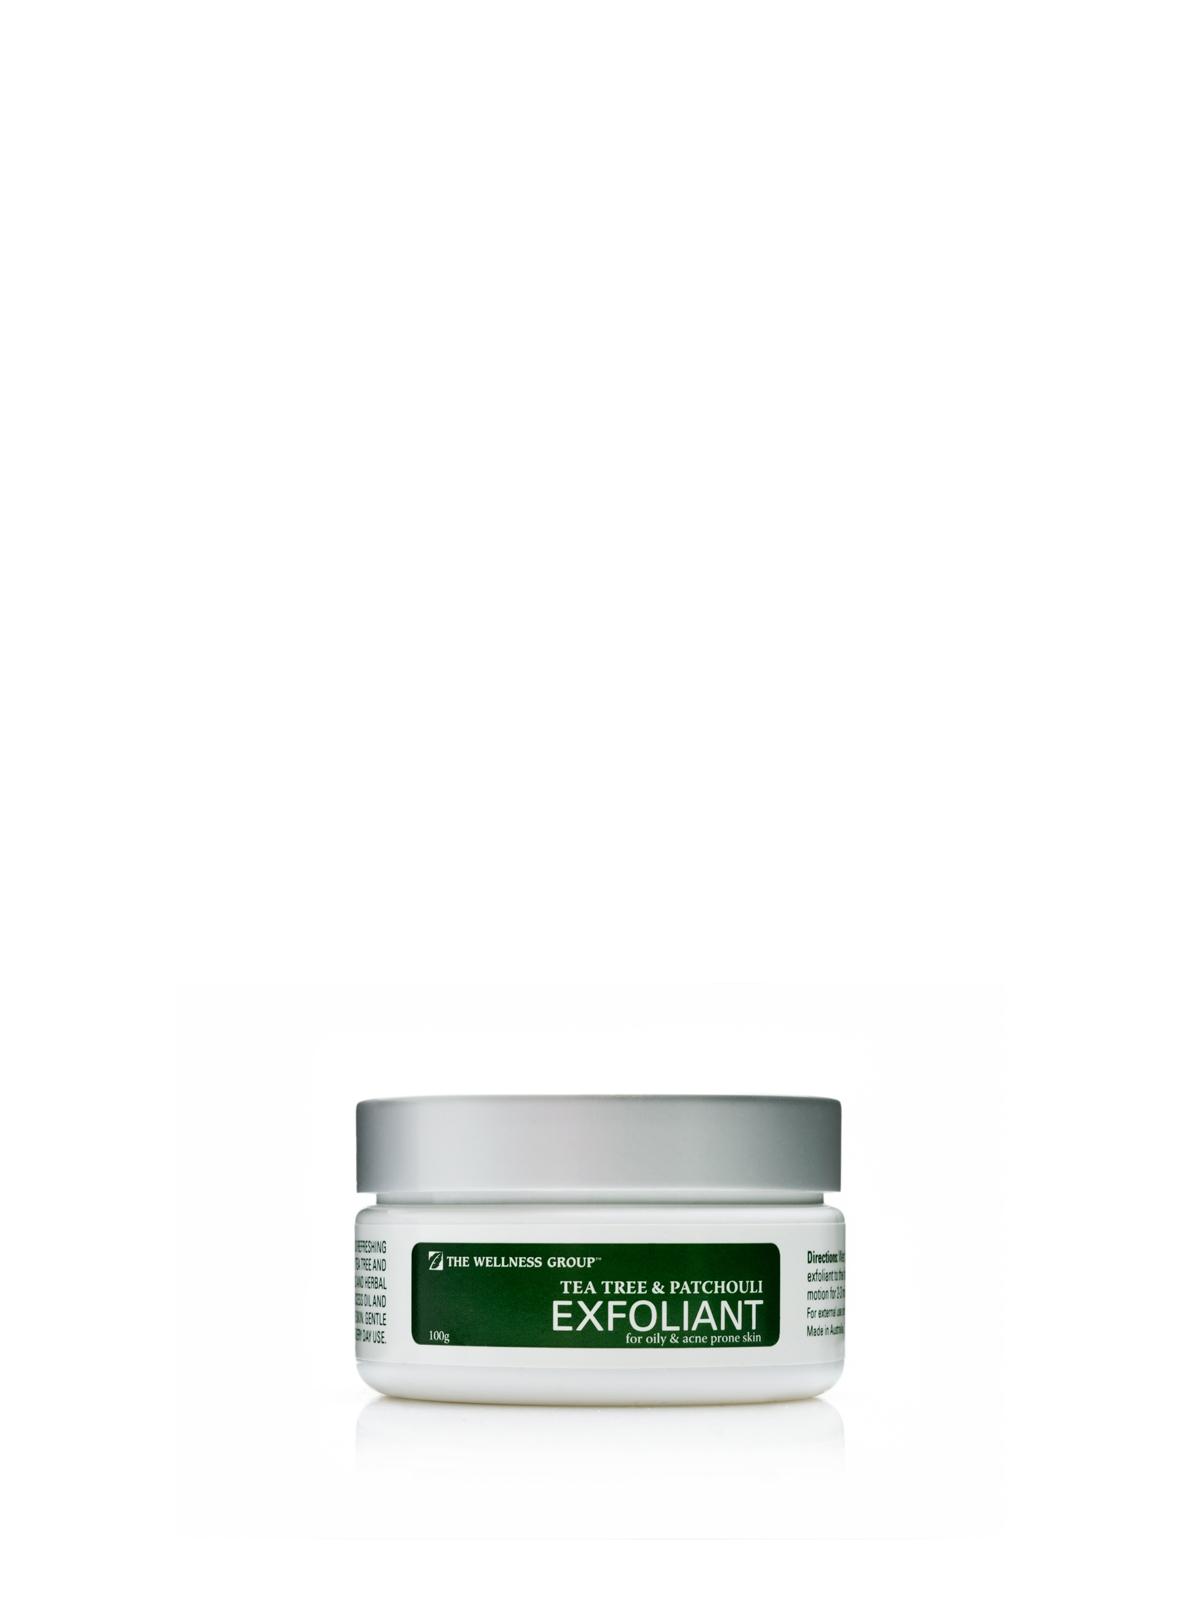 Tea Tree & Patchouli Exfoliant